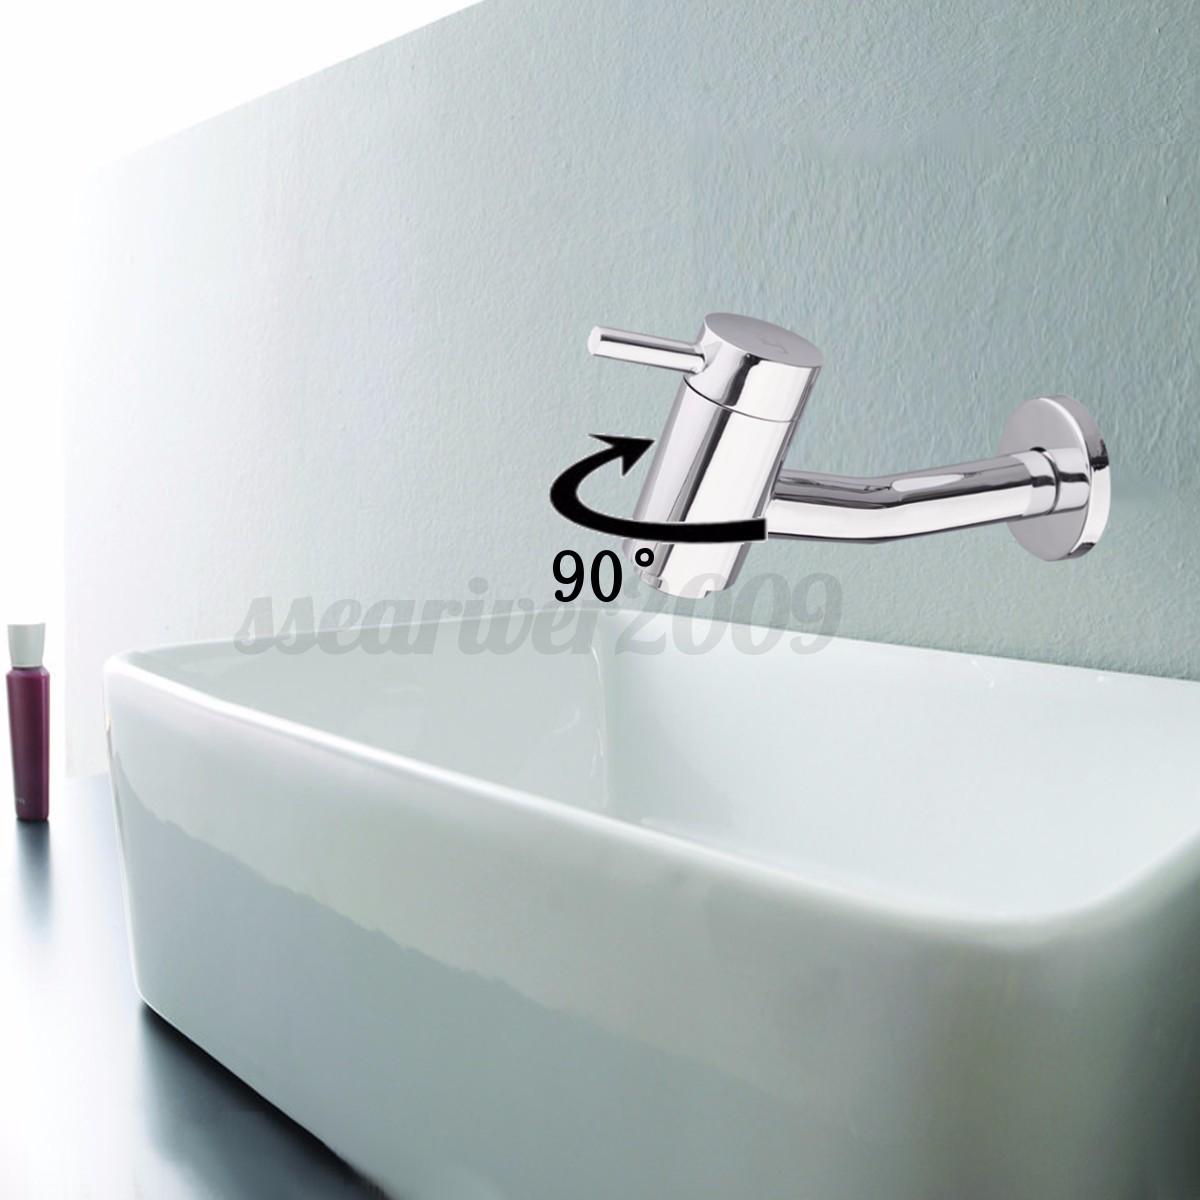 robinet 90 rotatif mural cascade lavabo evier laiton sink tap bassin salle bain ebay. Black Bedroom Furniture Sets. Home Design Ideas